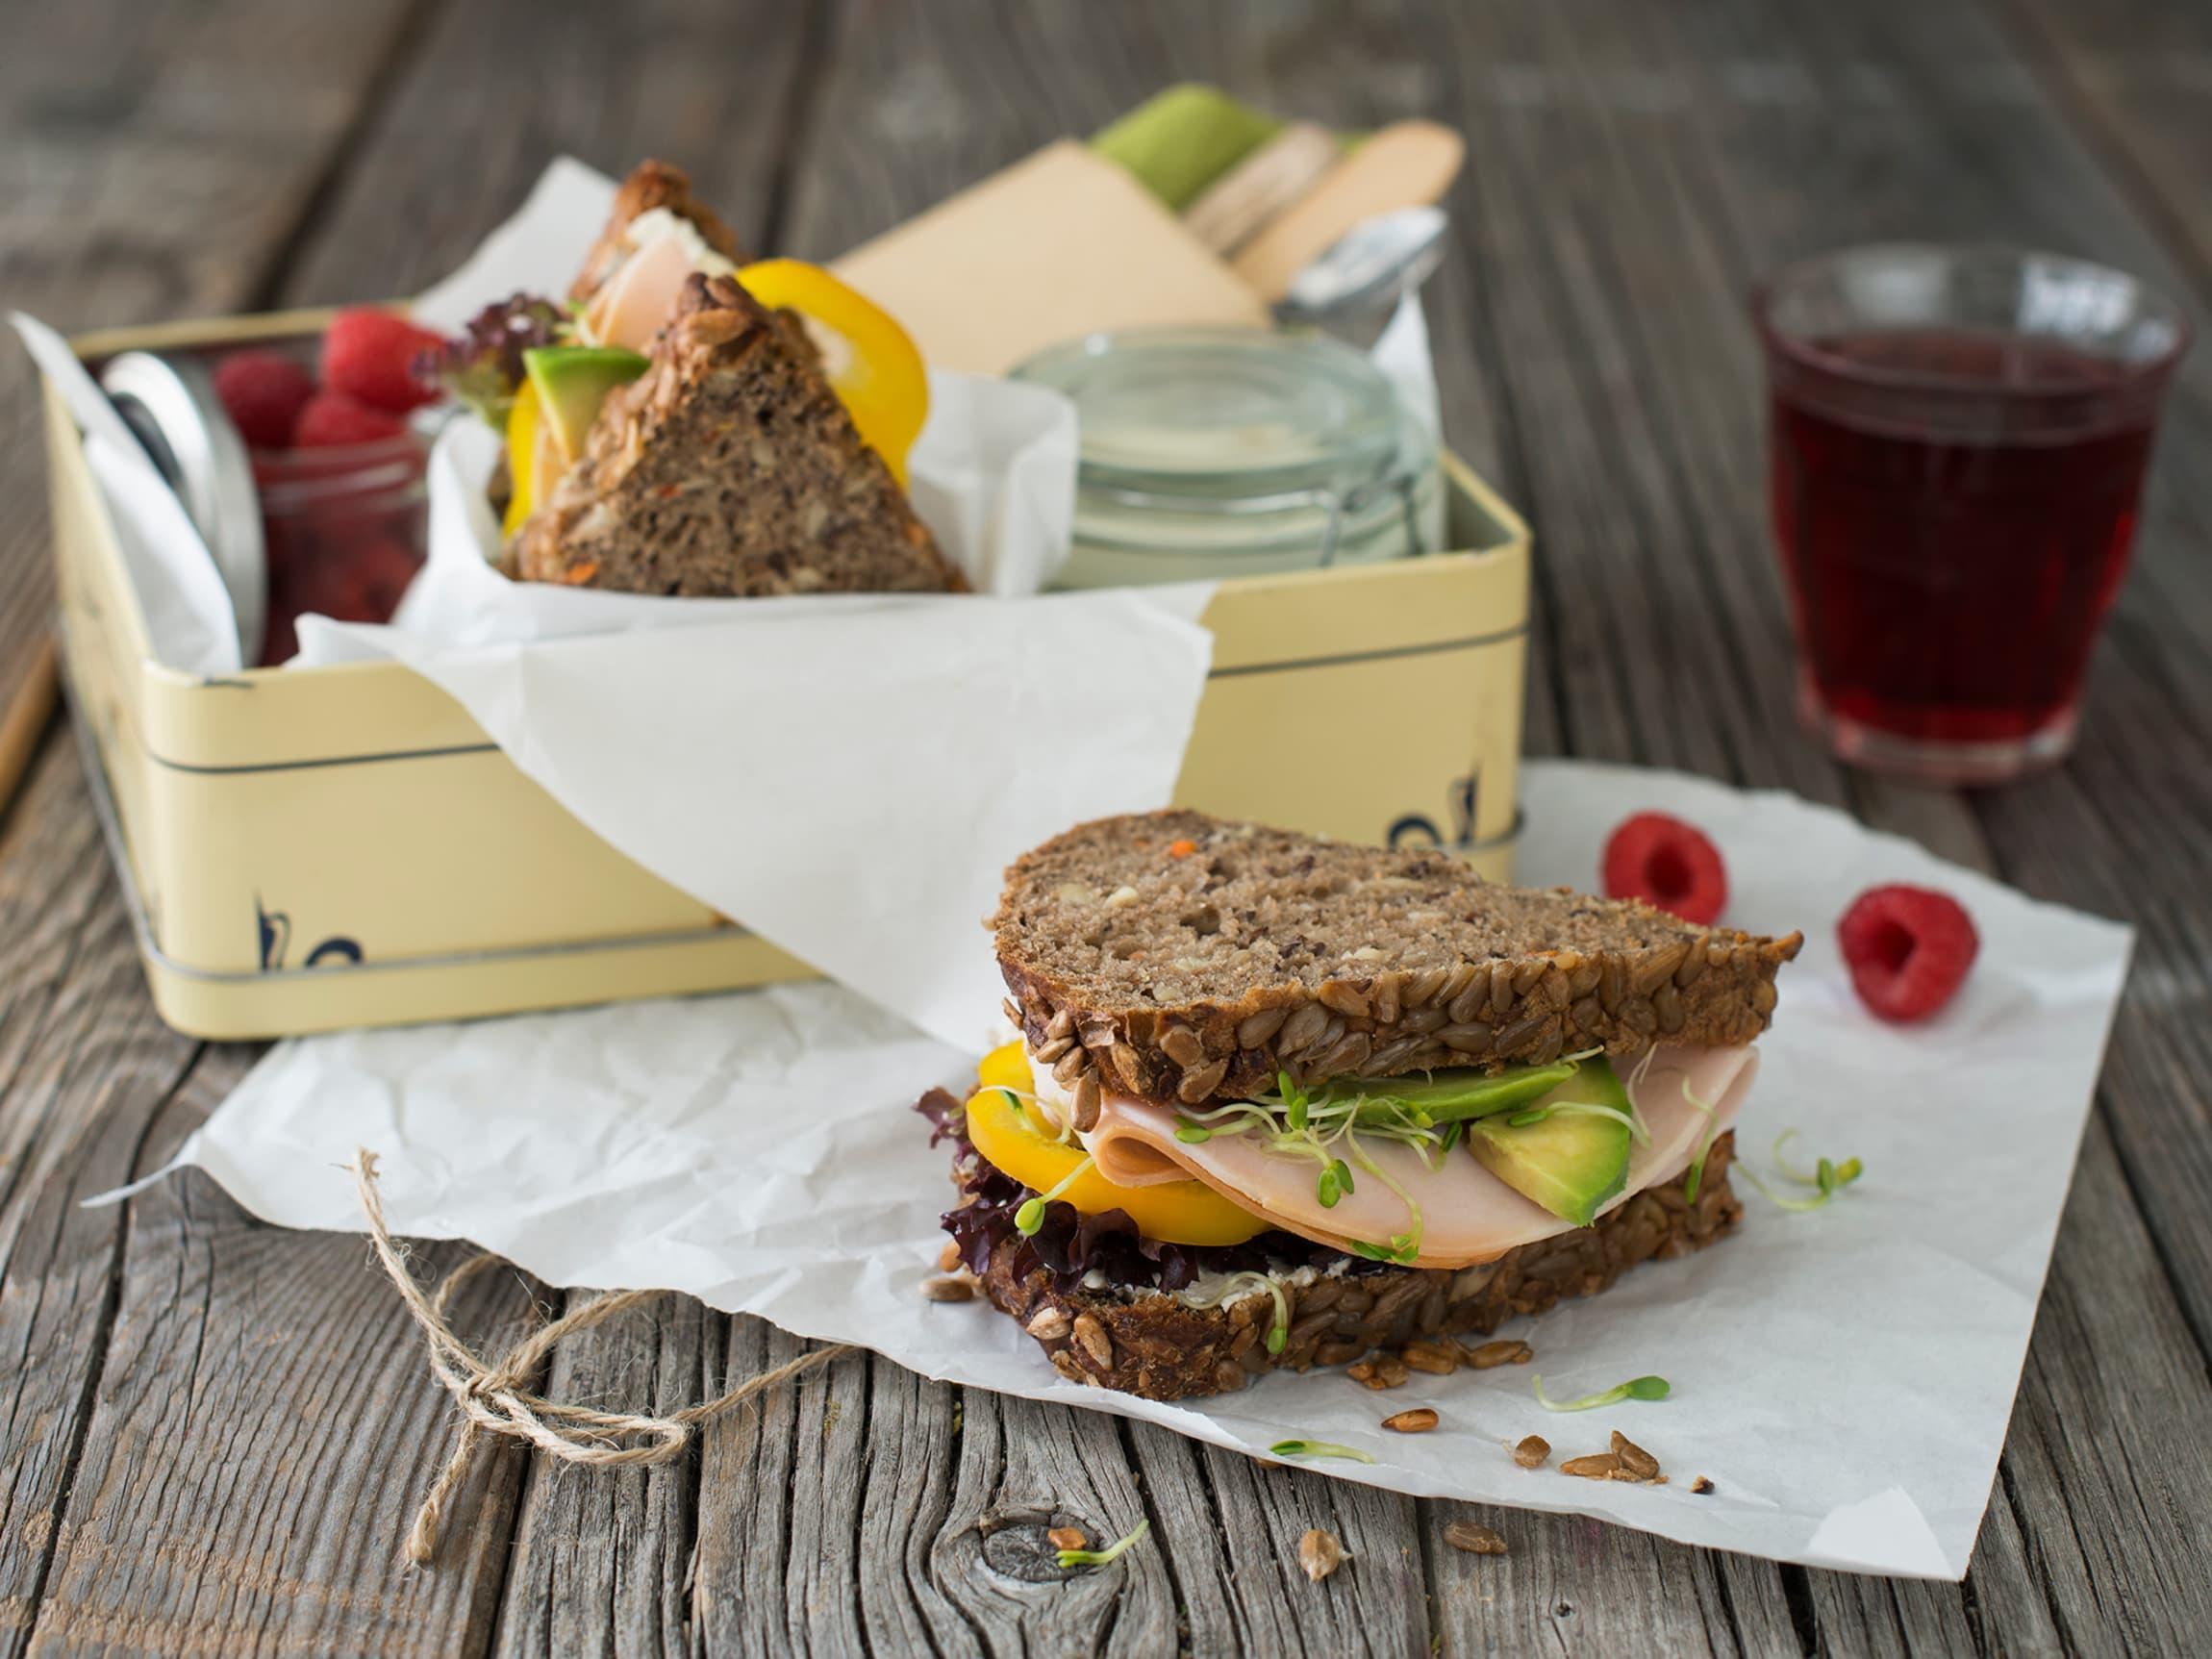 Saftig gulrotbrød med kalkunbryst egner seg godt som både frokost og lunsj